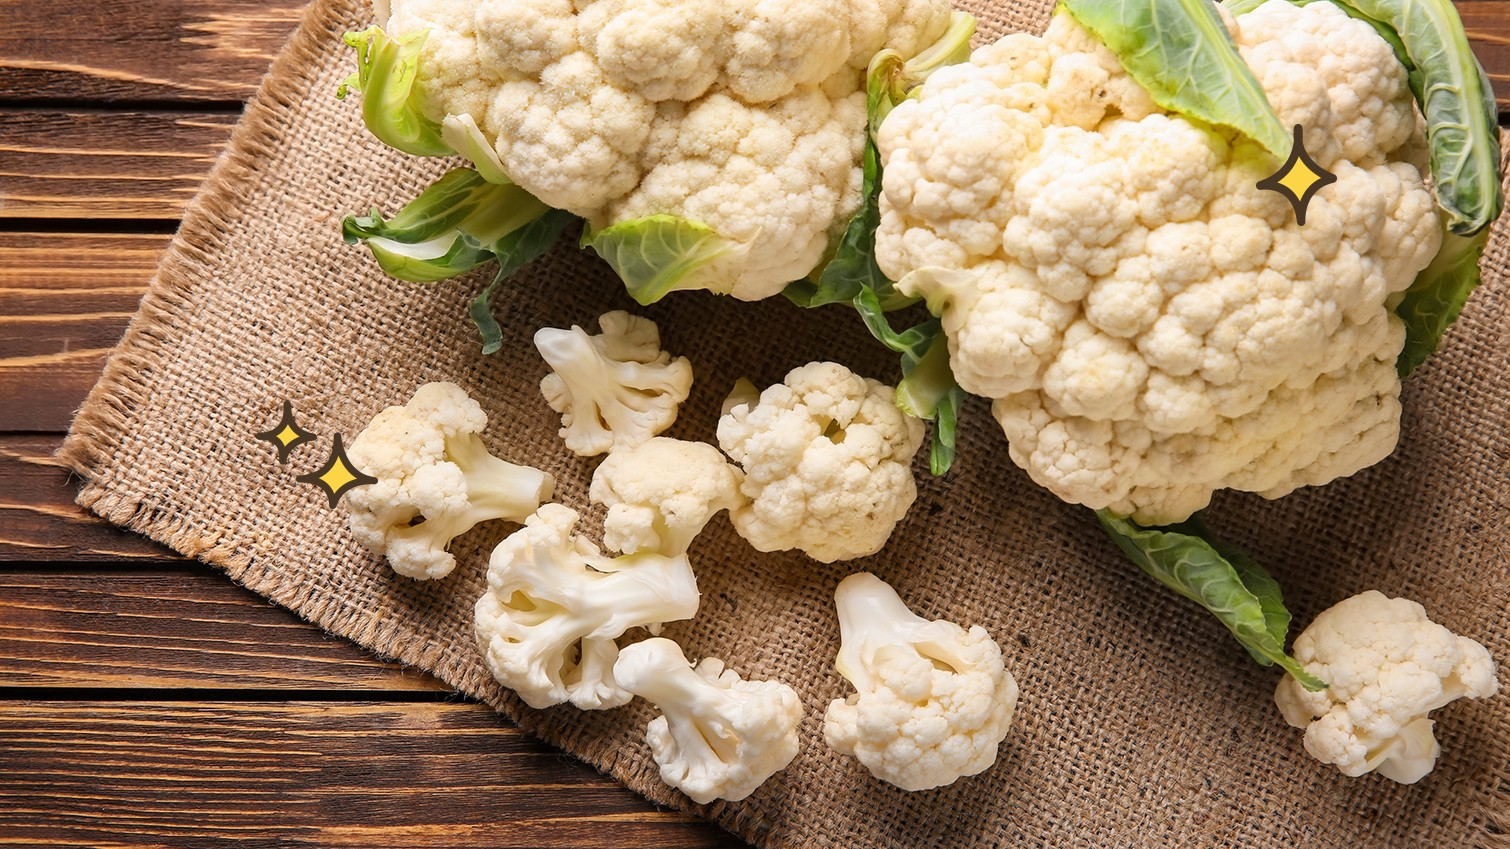 Meski Pucat 4 Makanan Berwarna Putih Ini Juga Bergizi Berbagi